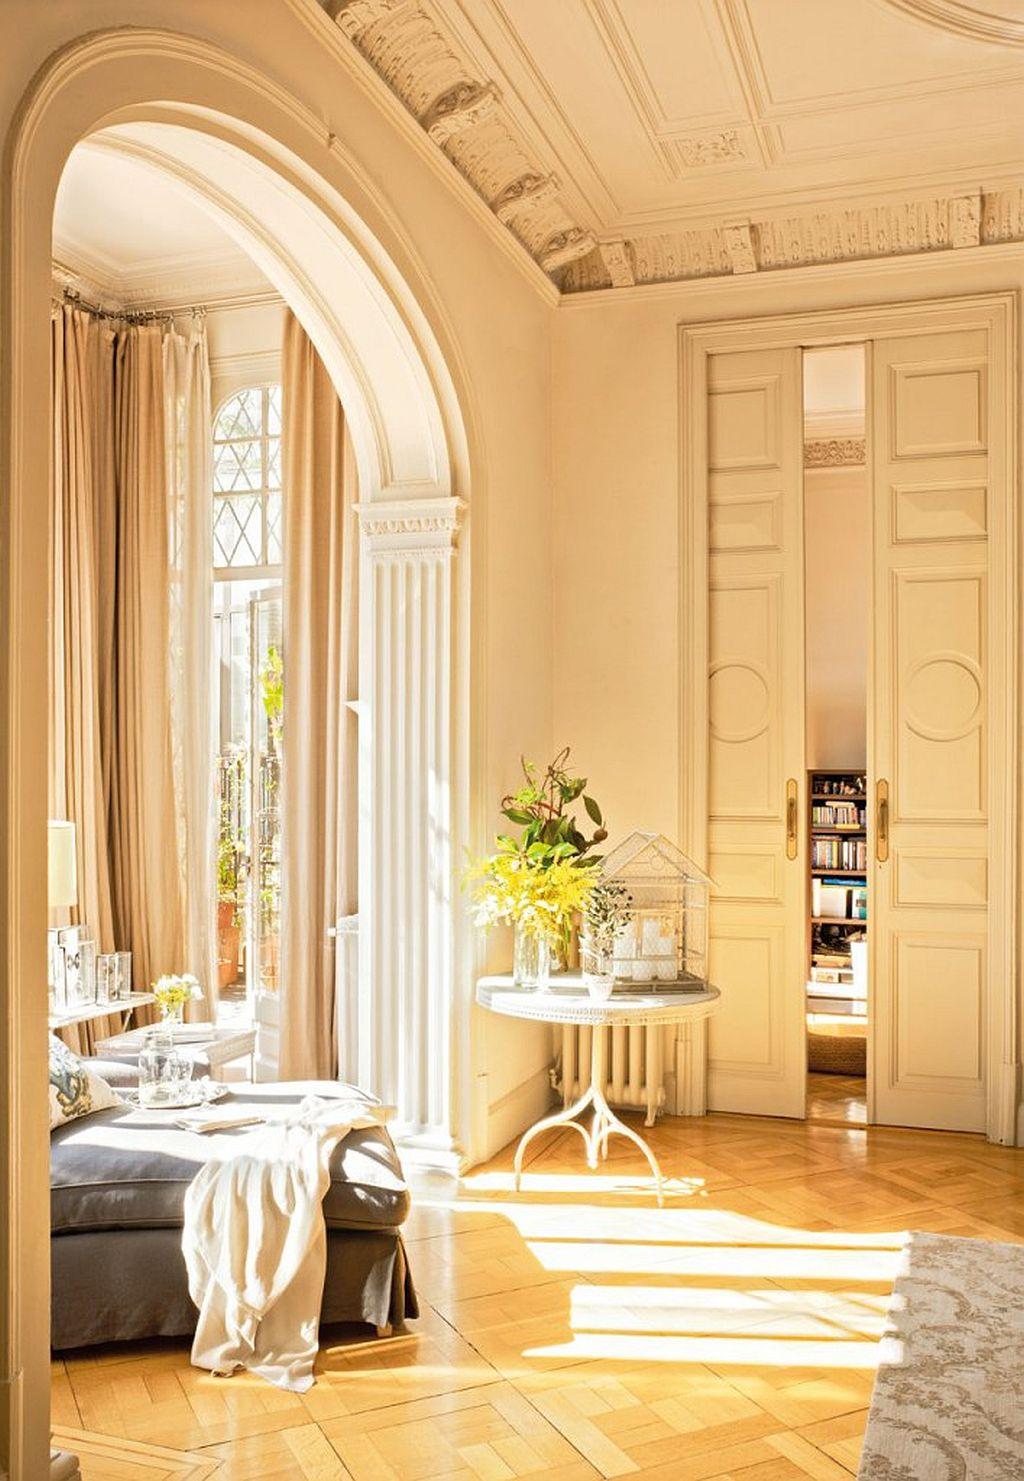 adelaparvu.com despre casa cu arhitectura veche Foto Elmueble (4)